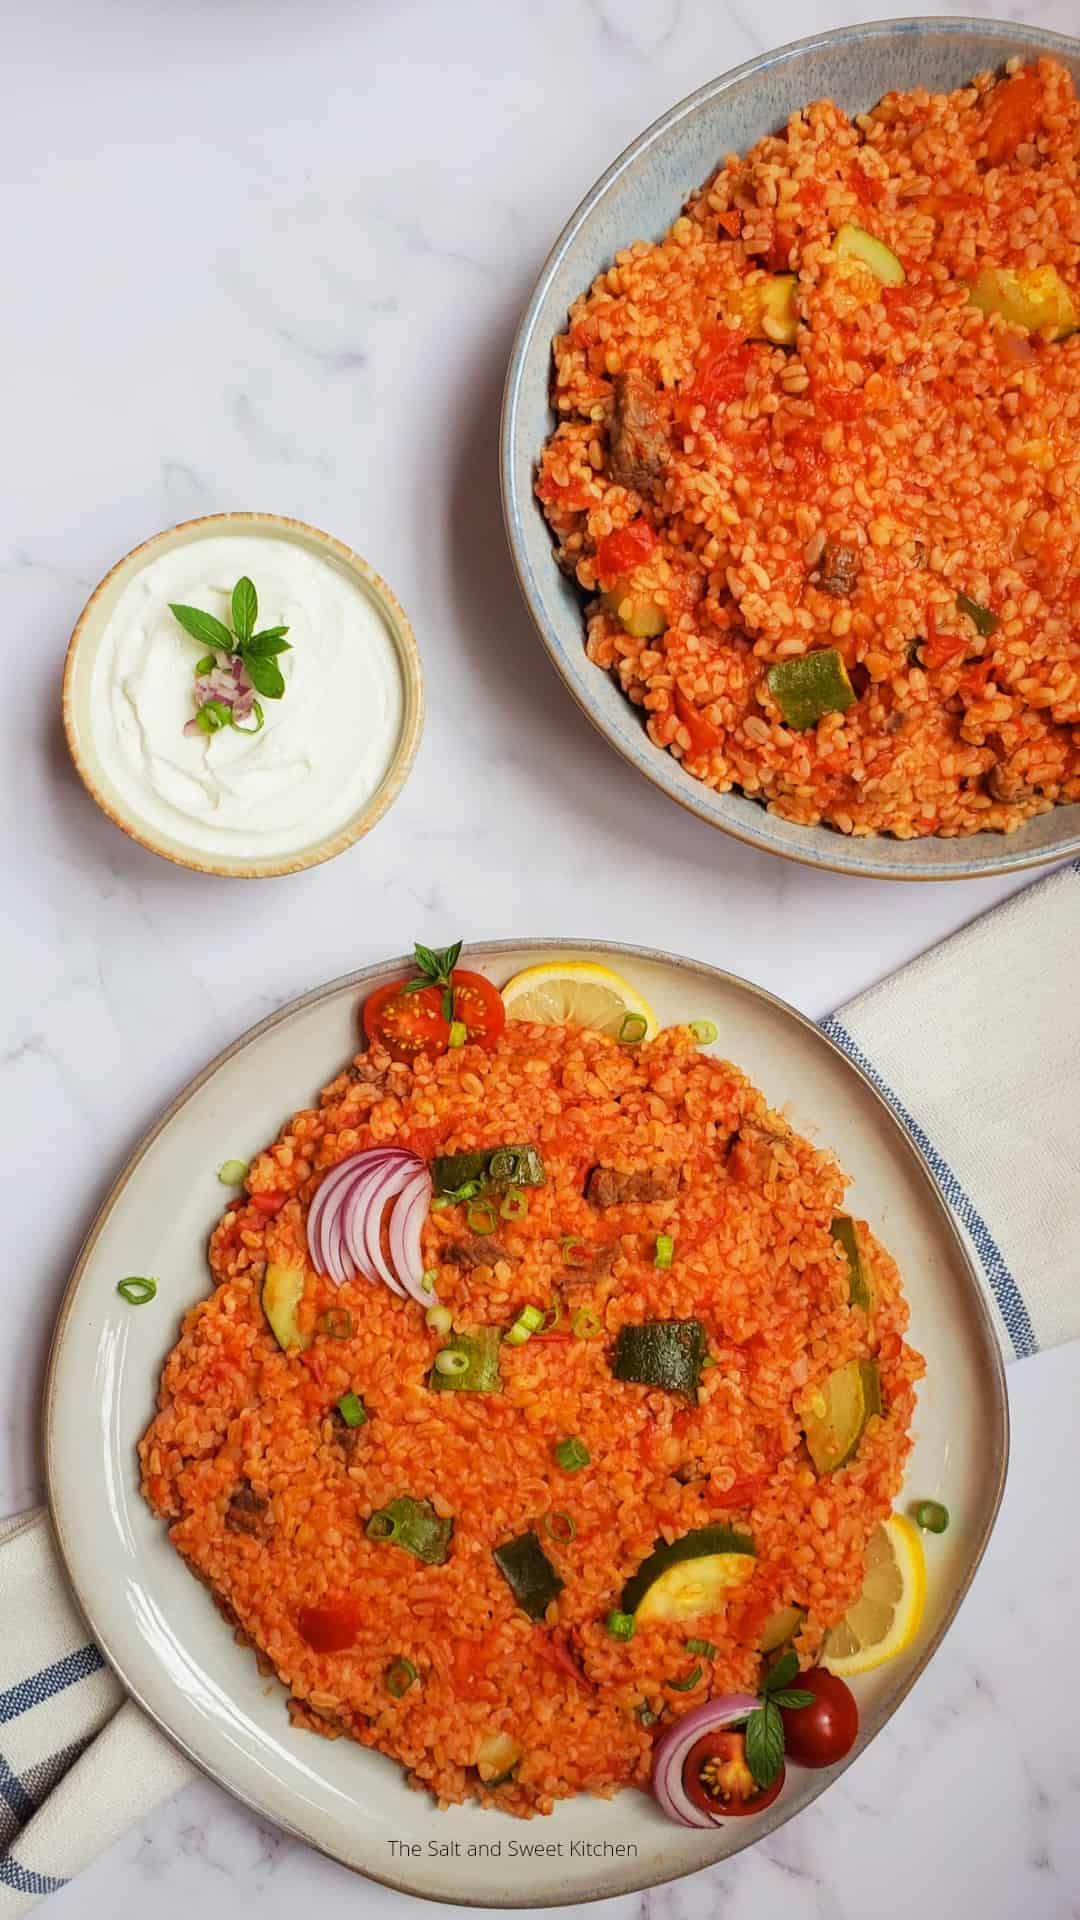 Bulgur Pilaf with Zucchini